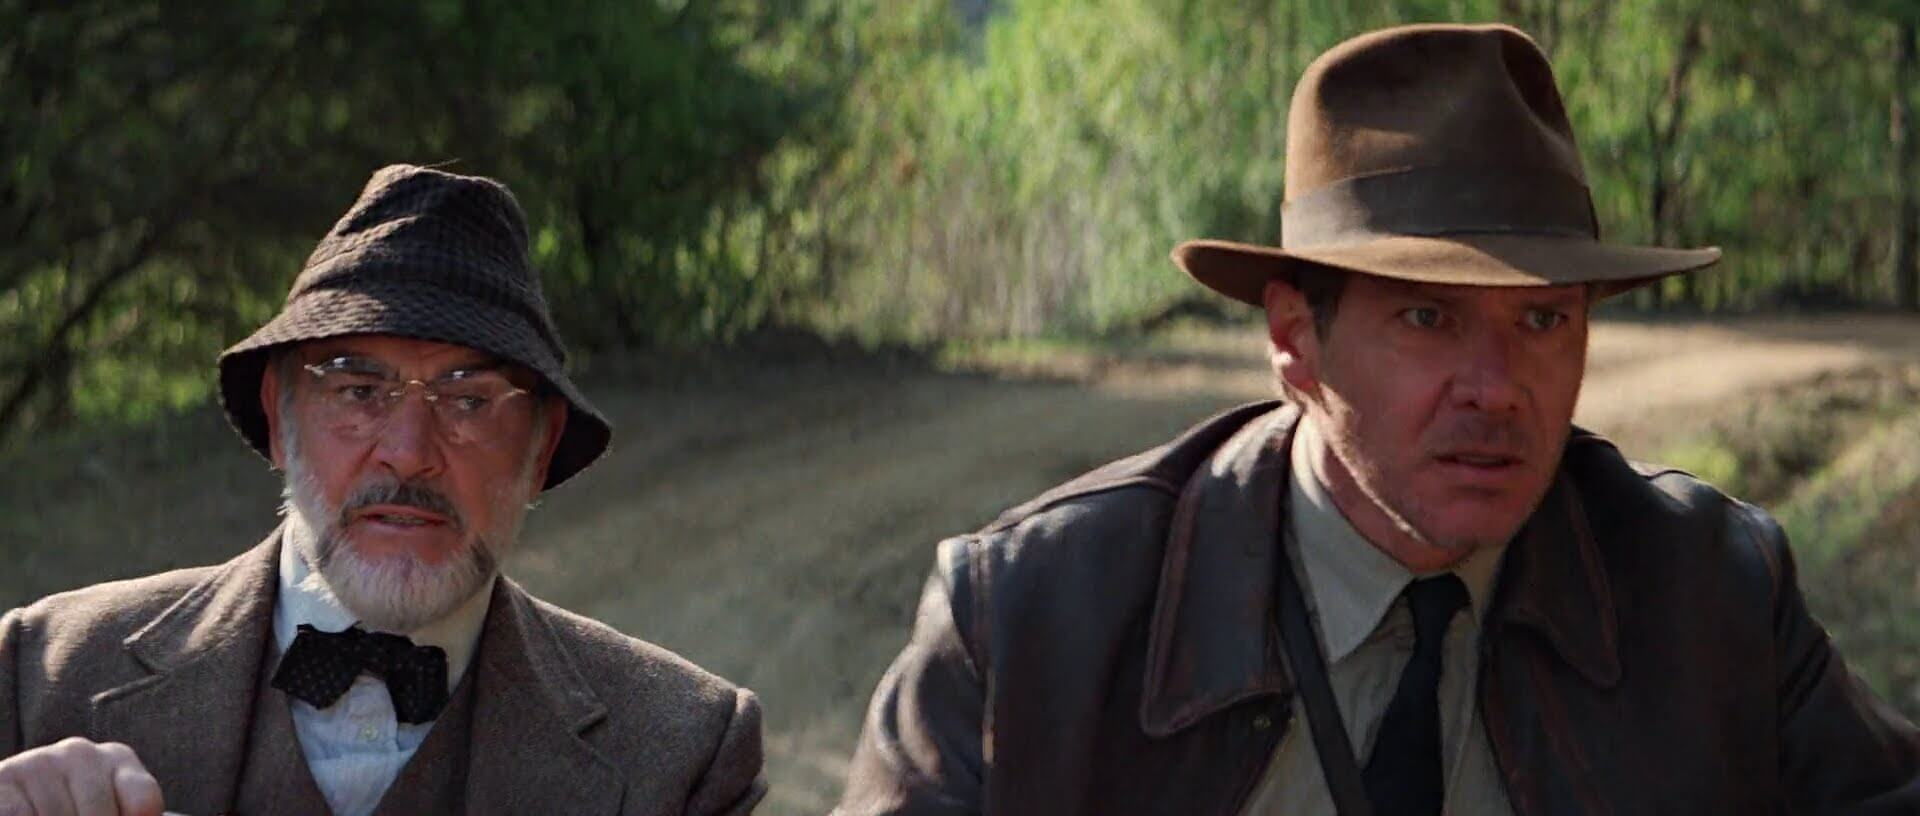 Internal and External Conflict - Indiana Jones